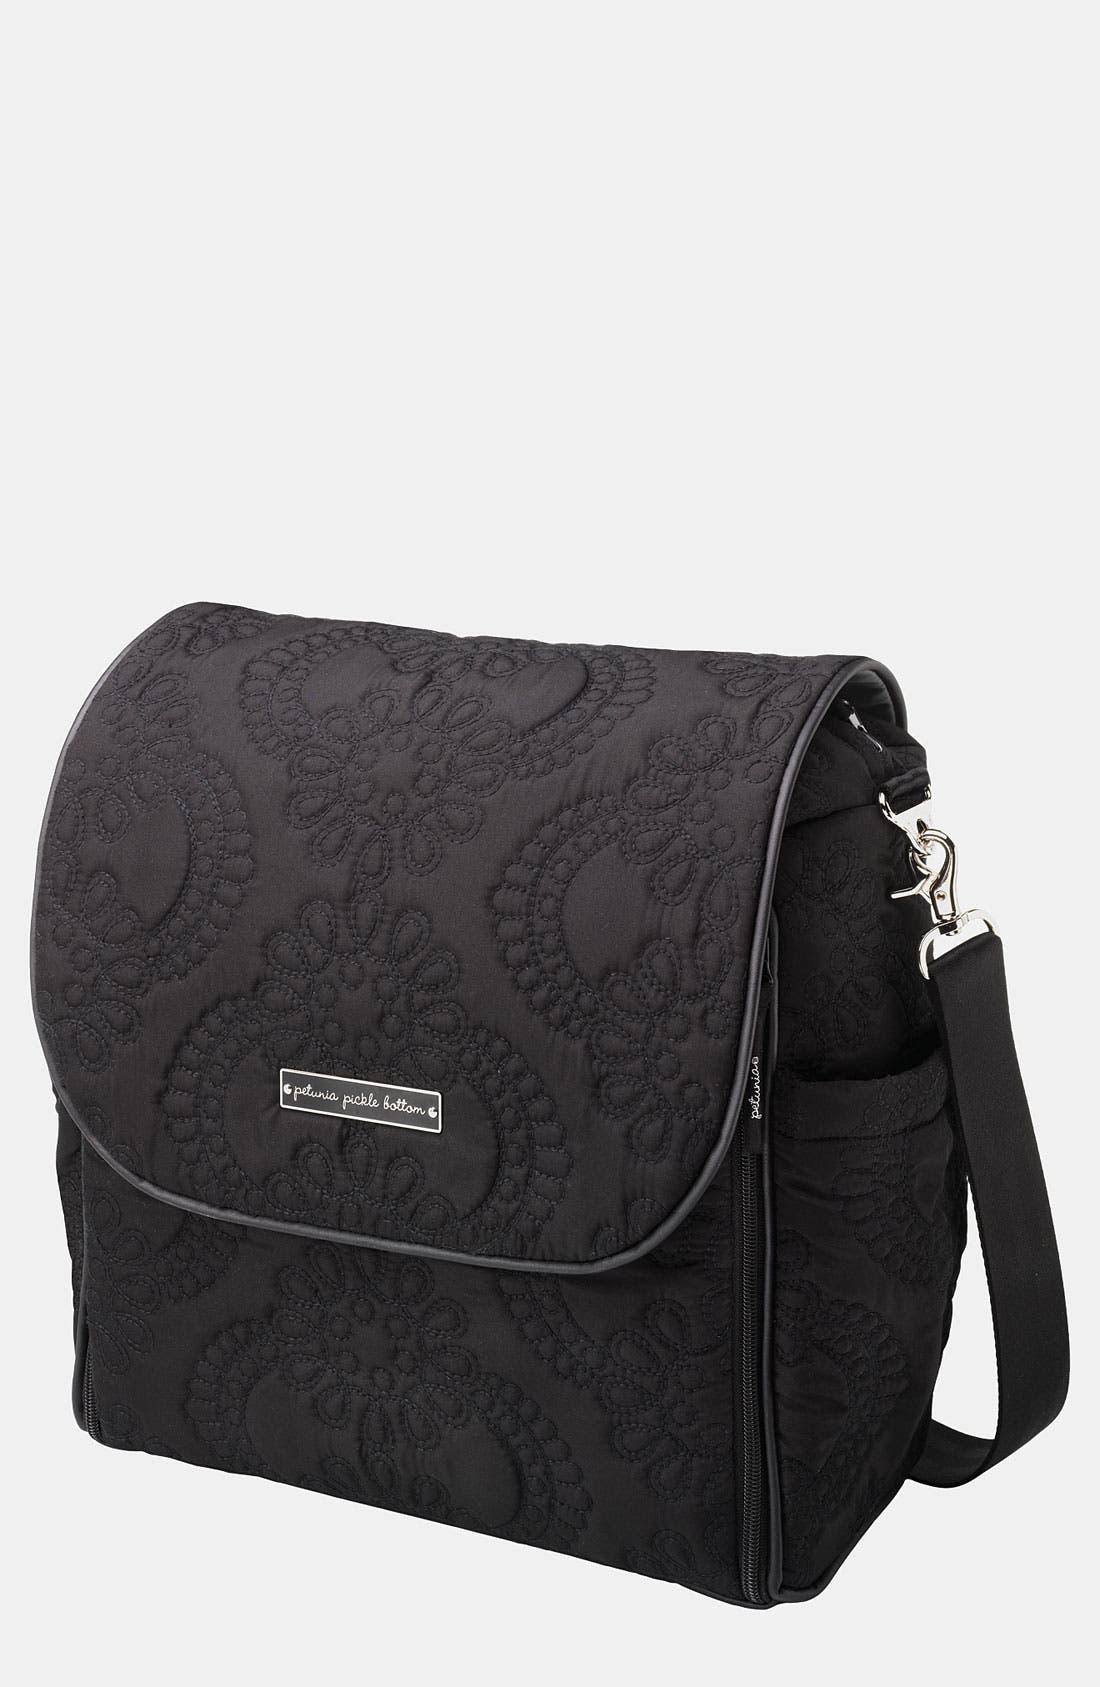 PETUNIA PICKLE BOTTOM 'Embossed Boxy' Magnetic Closure Backpack Diaper Bag, Main, color, 001